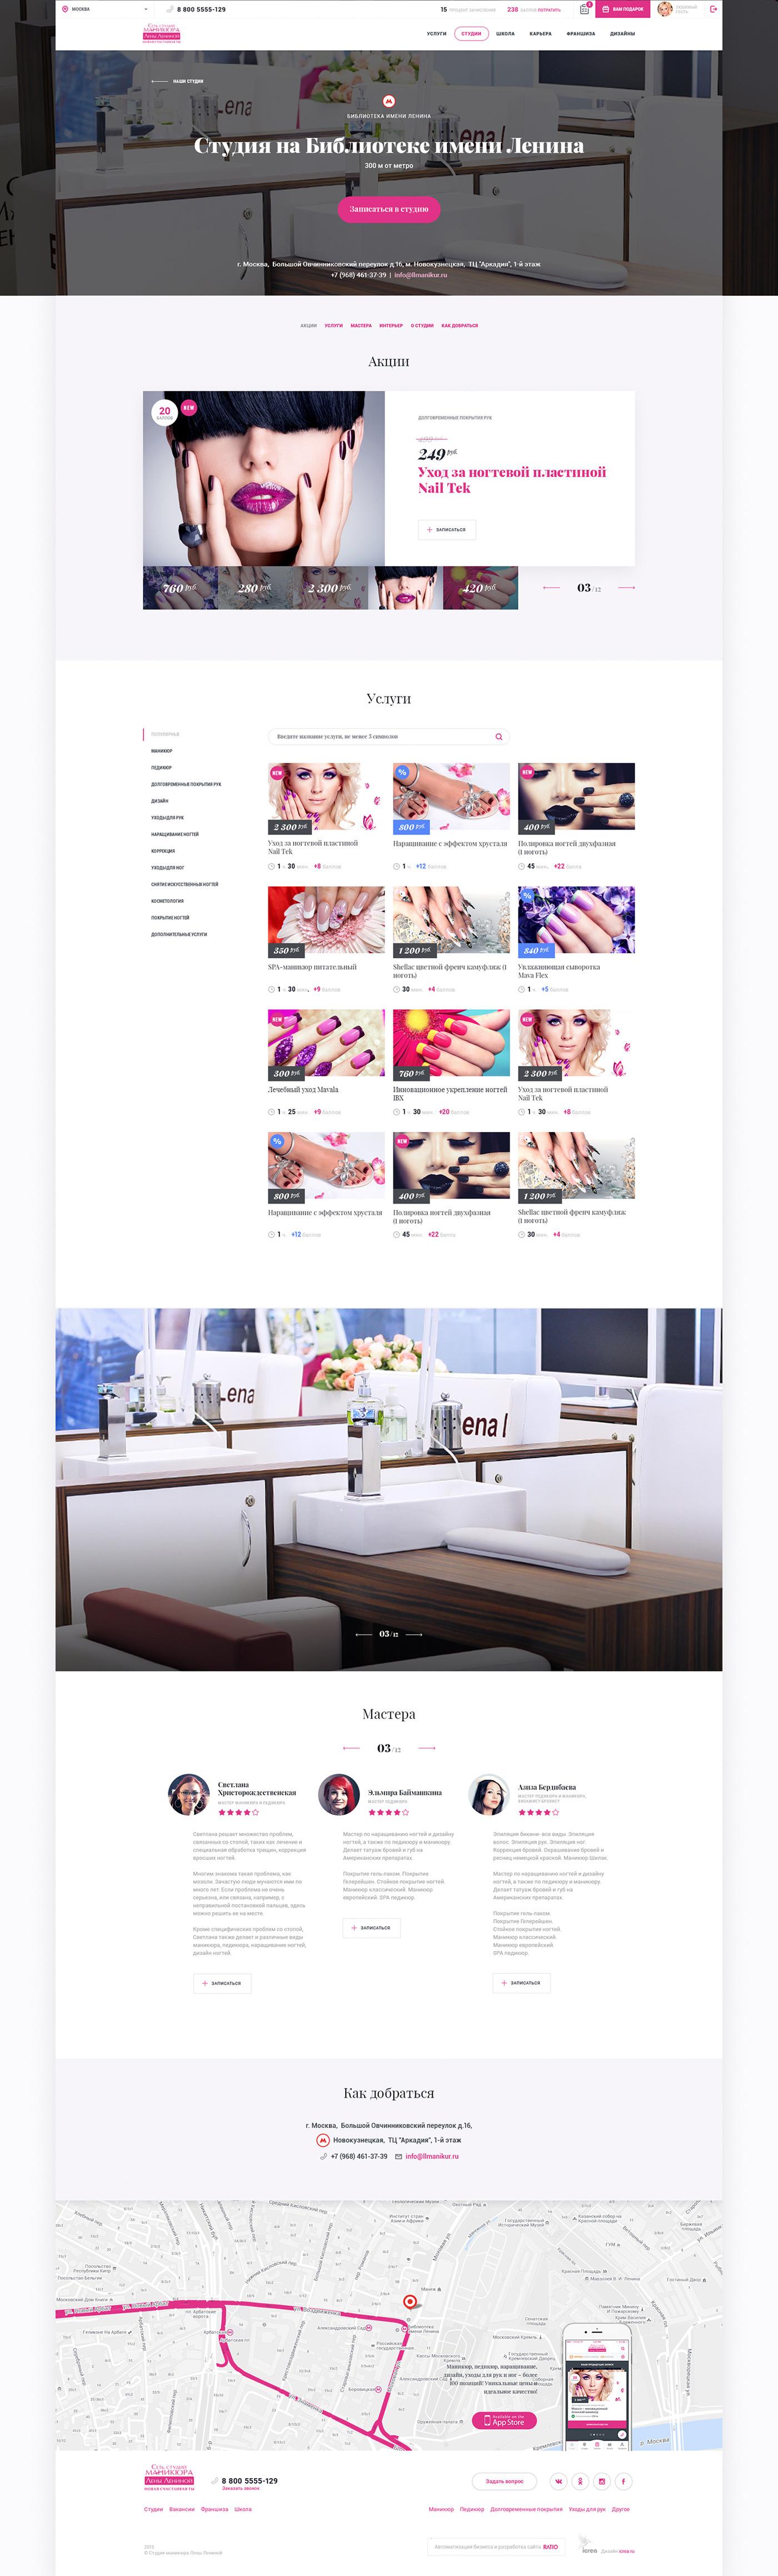 beauty manicure pedicure beauty salon app studio